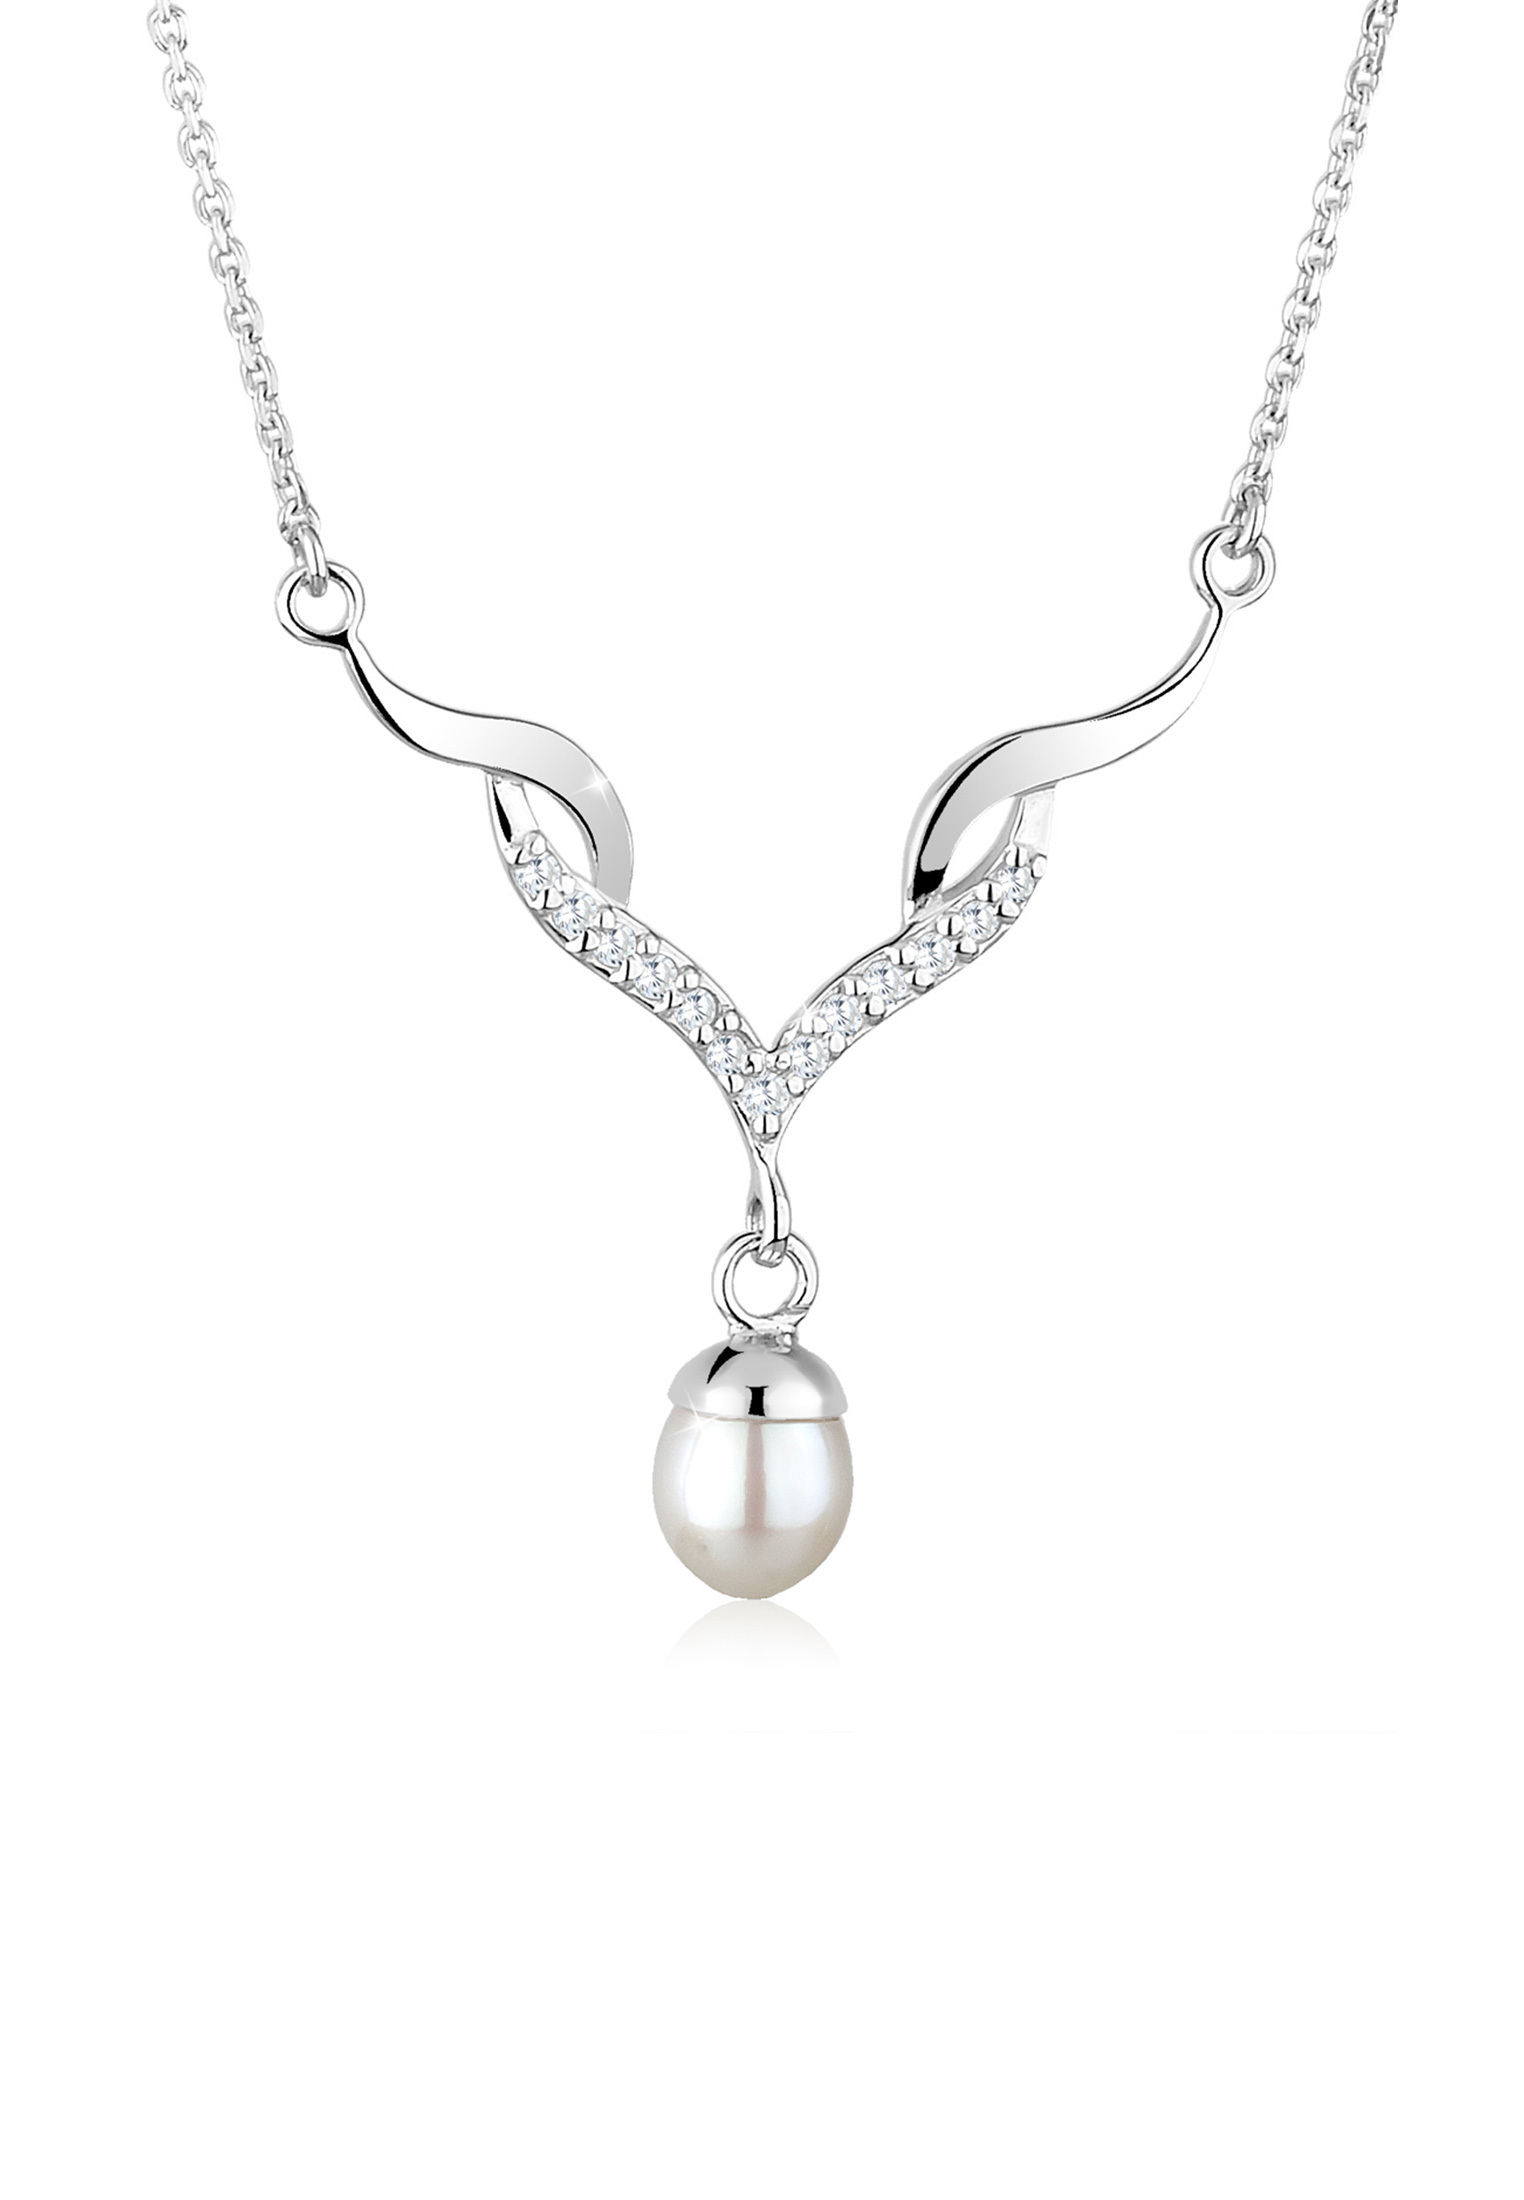 Halskette | Süßwasserperle, Zirkonia ( Weiß ) | 925er Sterling Silber